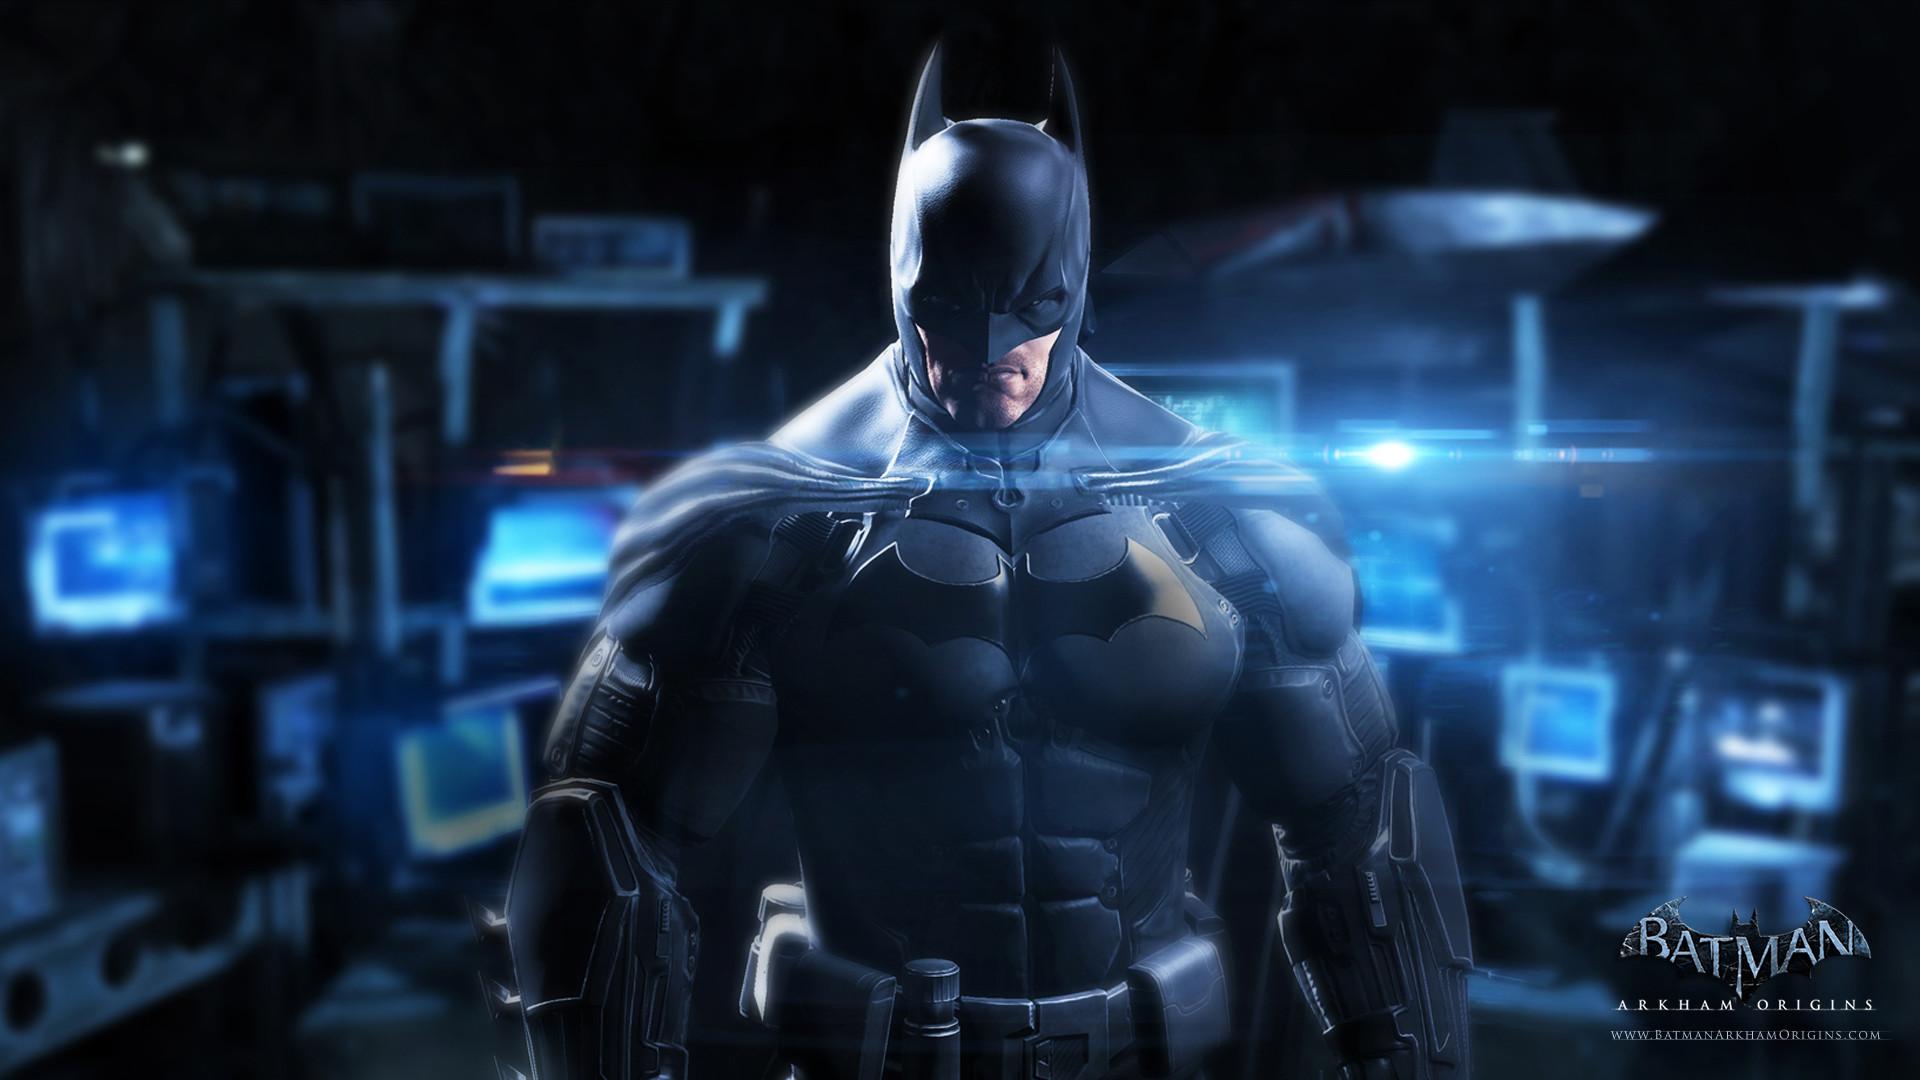 2013 Batman Arkham Origins wallpapers (67 Wallpapers)